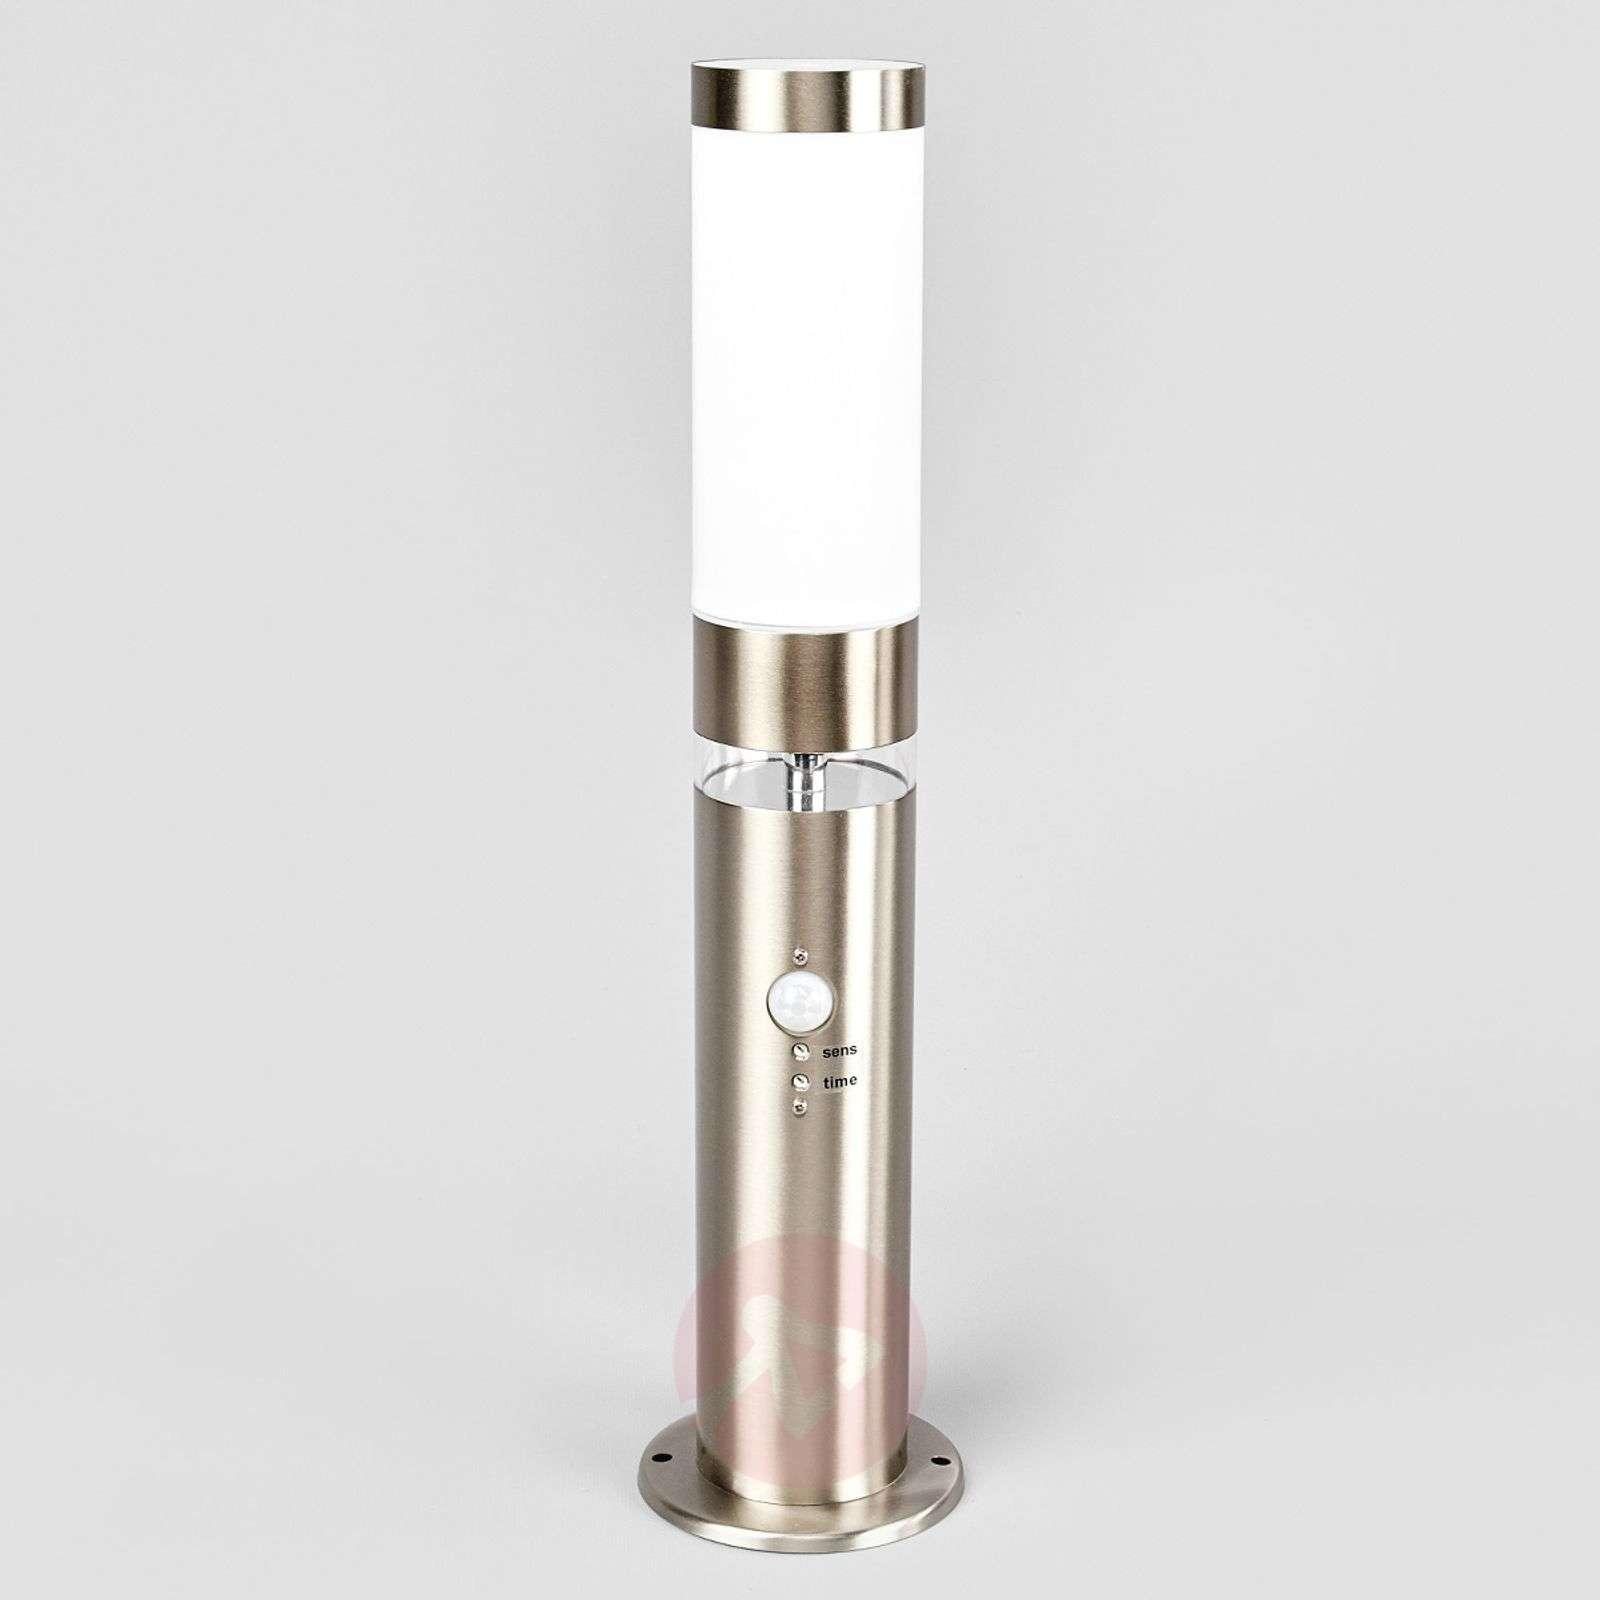 Stainless steel pillar light Binka with sensor-9647025-02